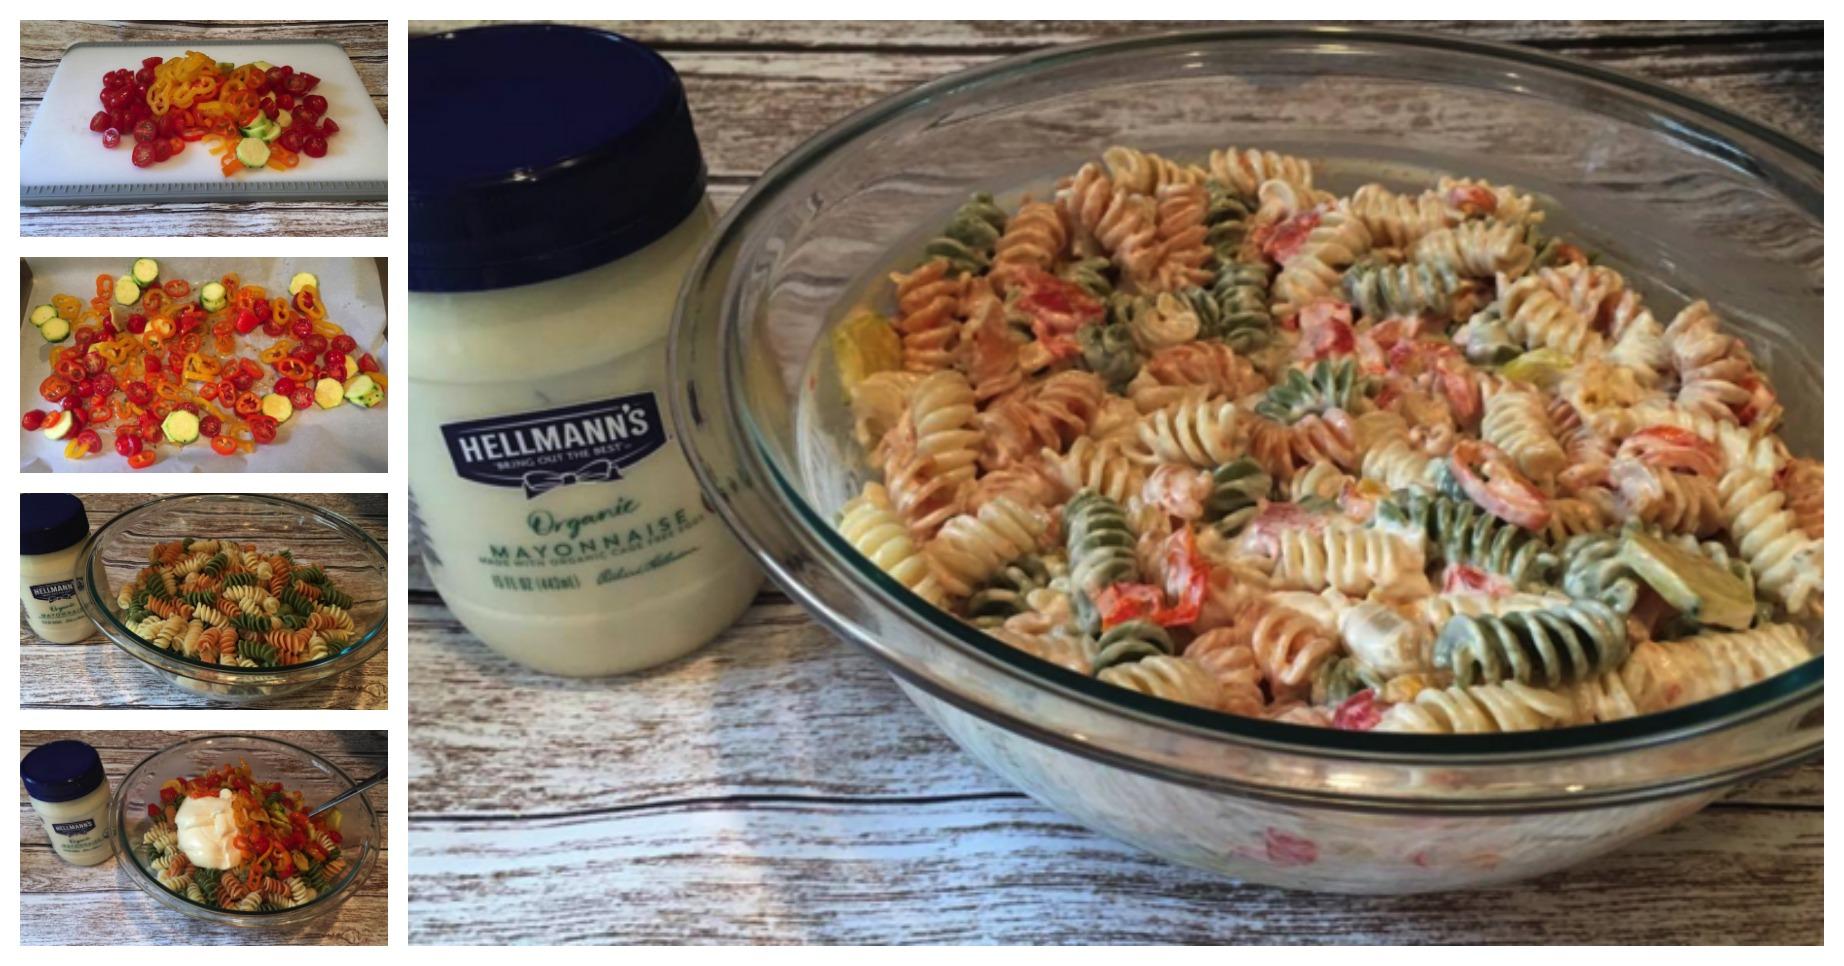 Hellmann's recipe collage